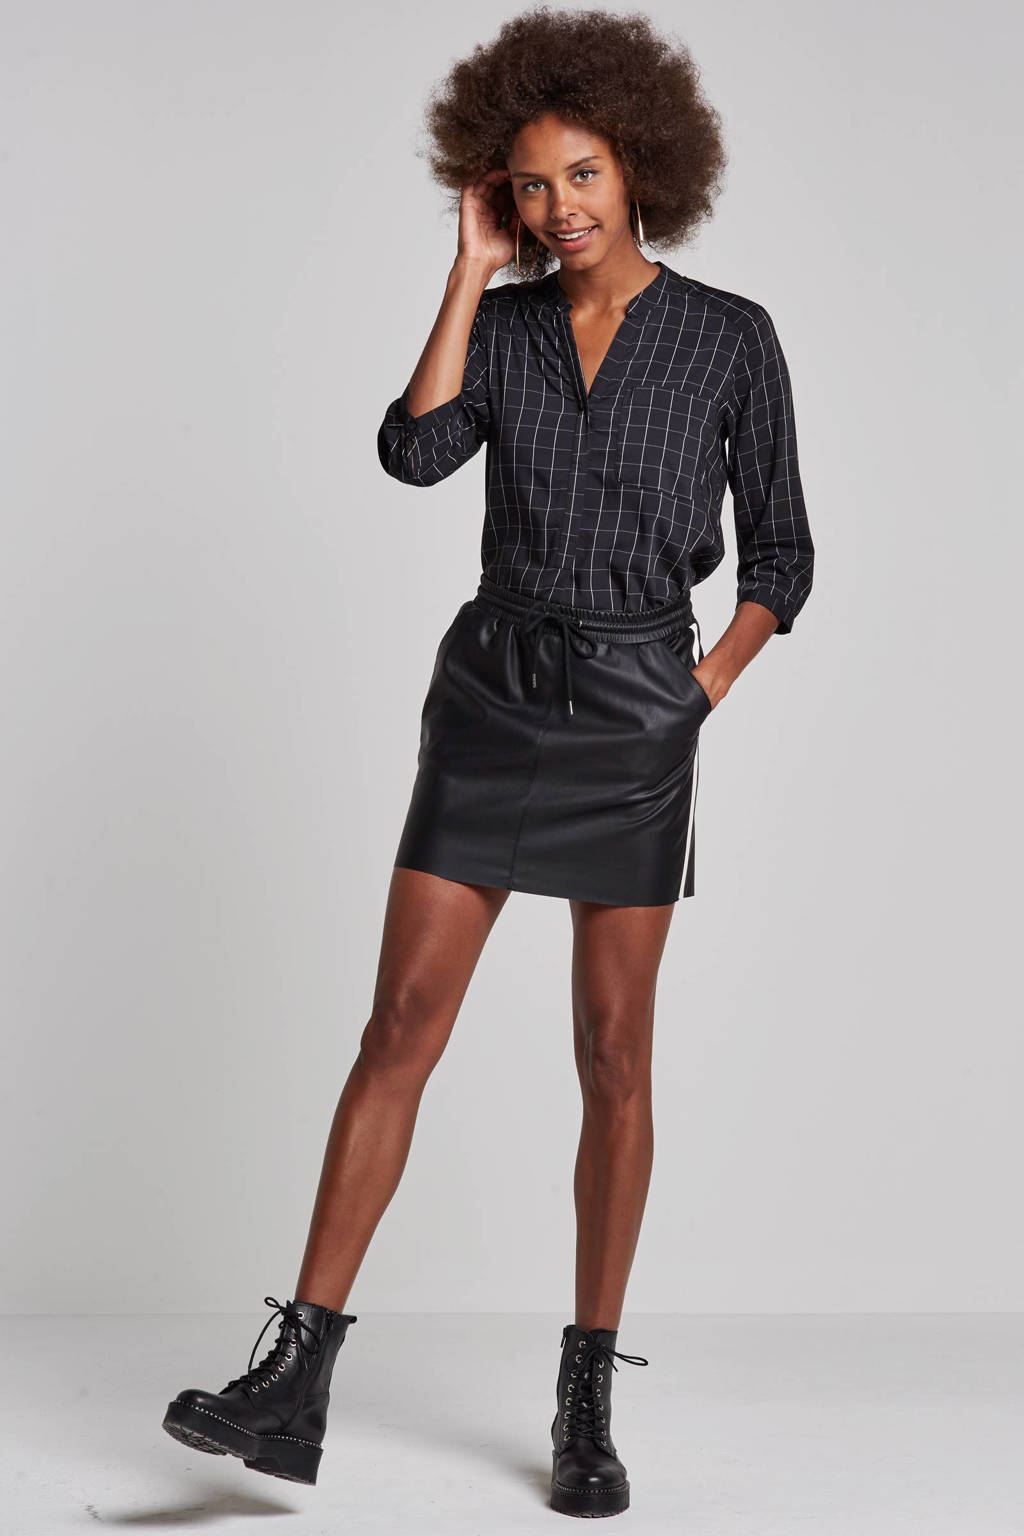 VERO MODA blouse met ruitdessin, Zwart/wit